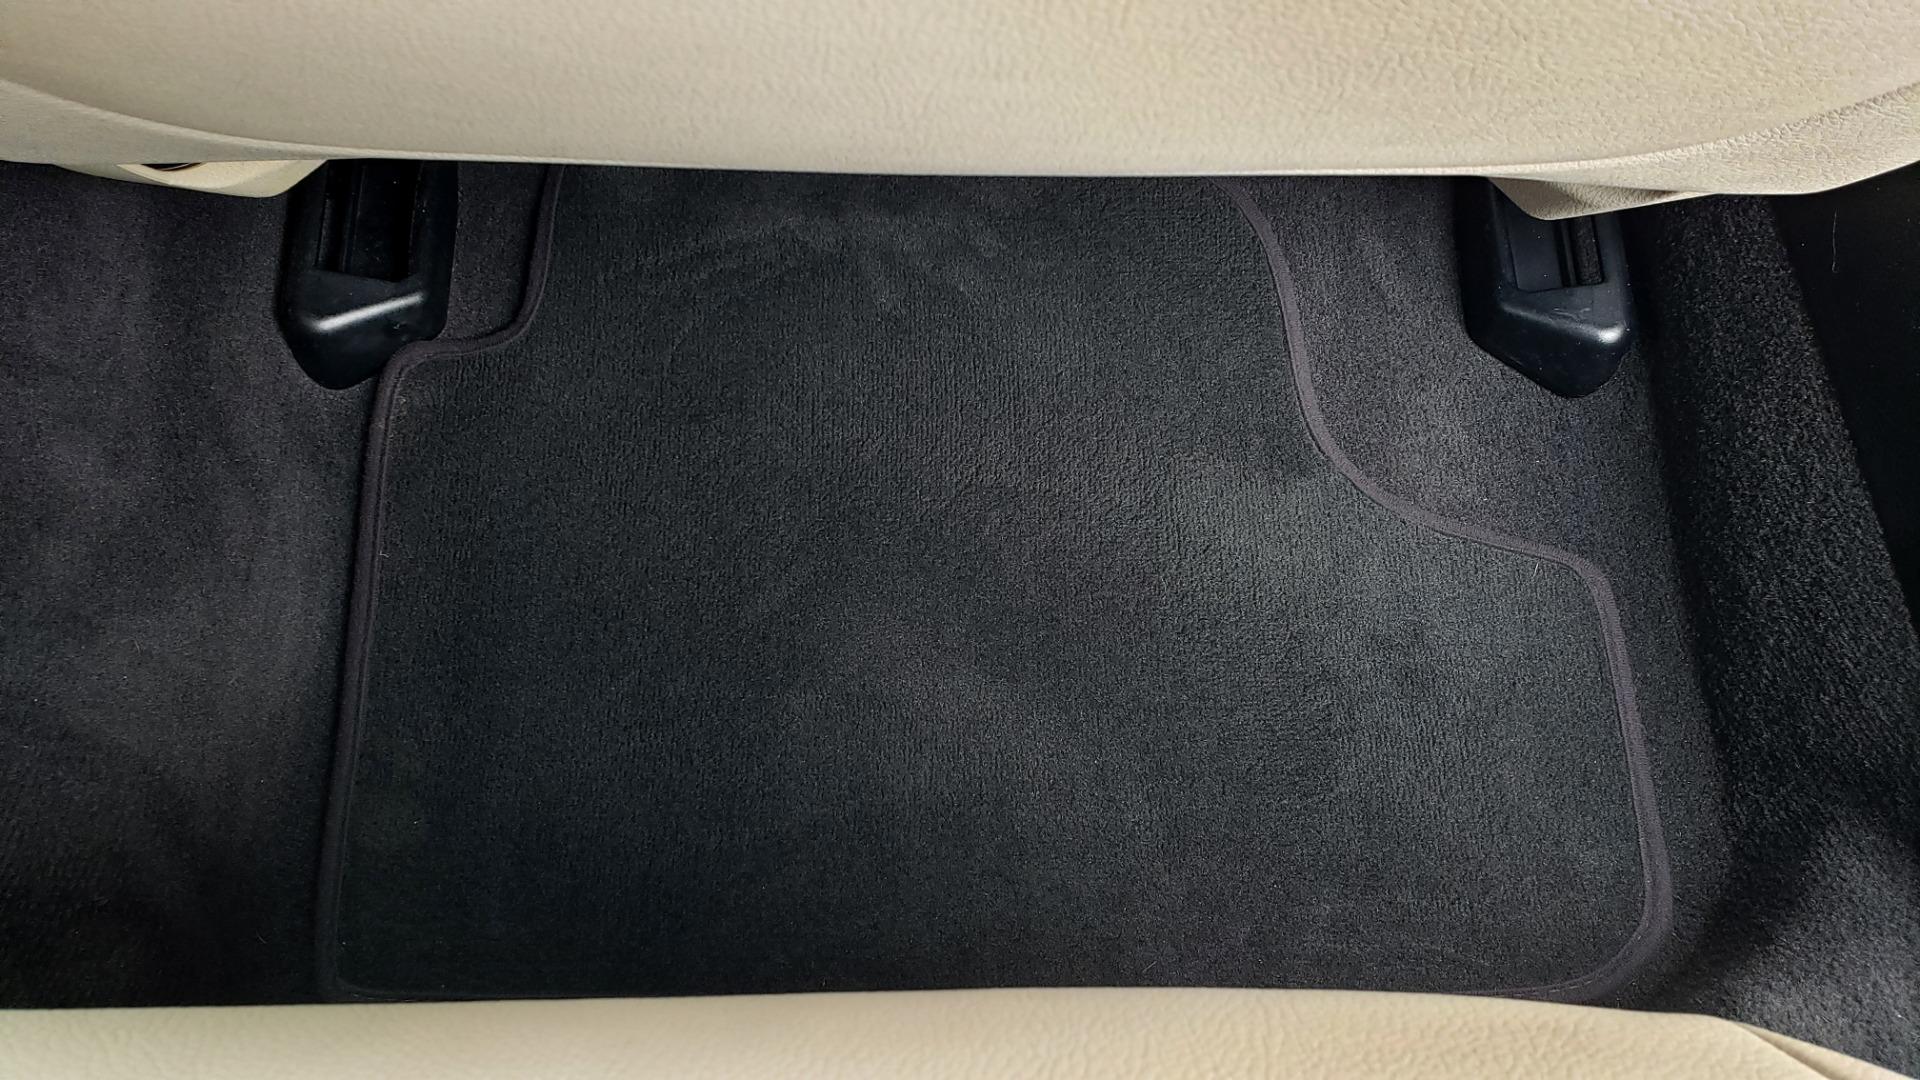 Used 2012 BMW 5 SERIES 550I M SPORT / NAV / CONV PKG / SUNROOF / PREM SND / REARVIEW for sale Sold at Formula Imports in Charlotte NC 28227 63